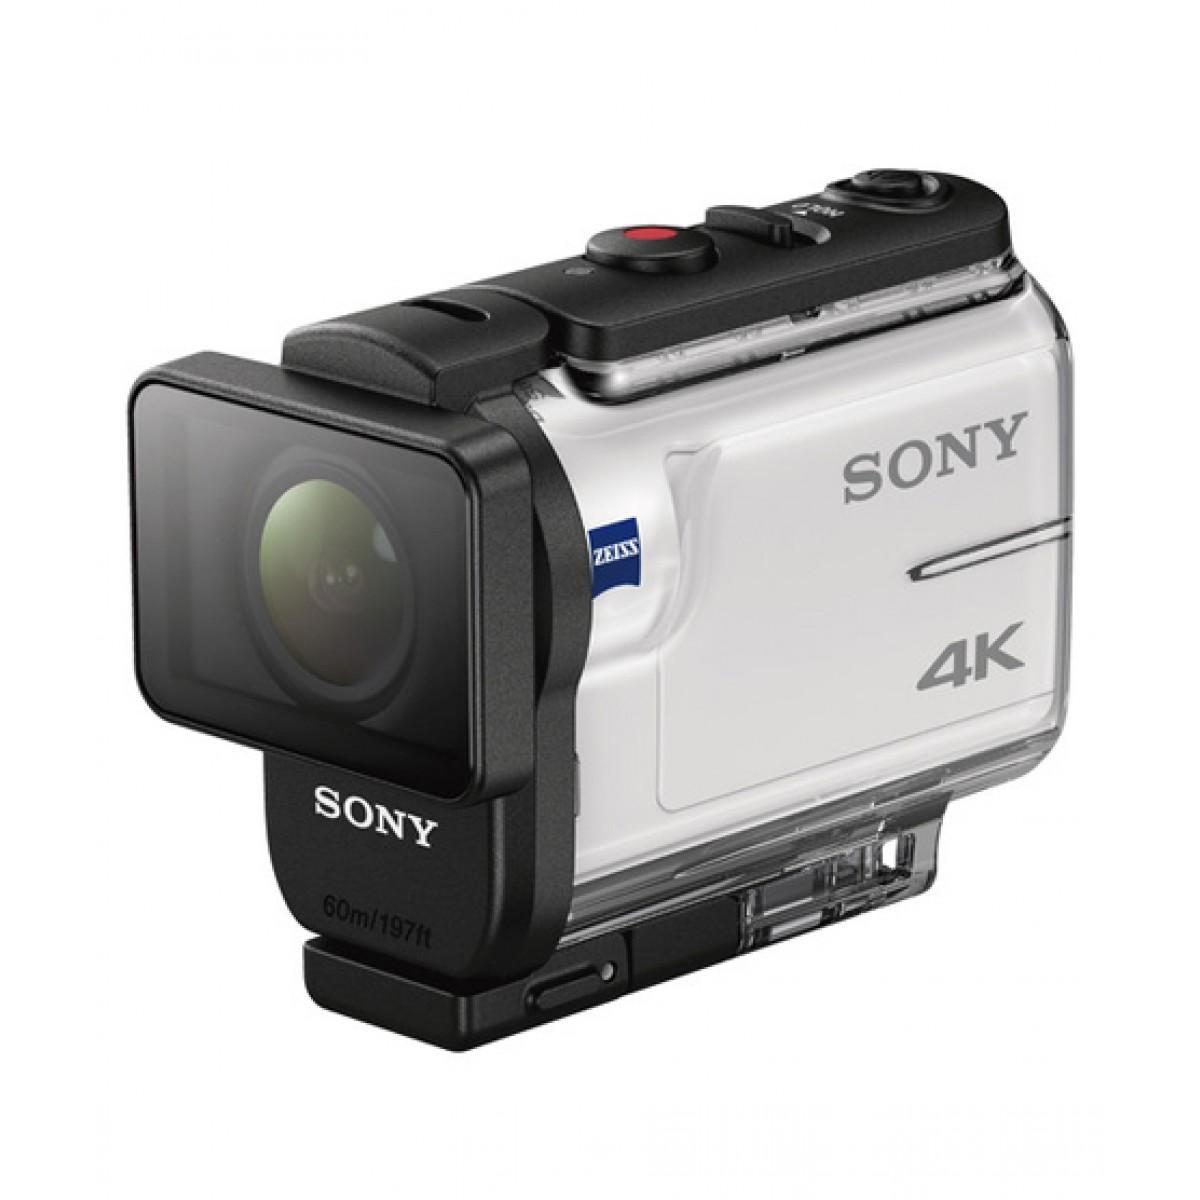 Sony 4k Camera   2020 Top Car Models